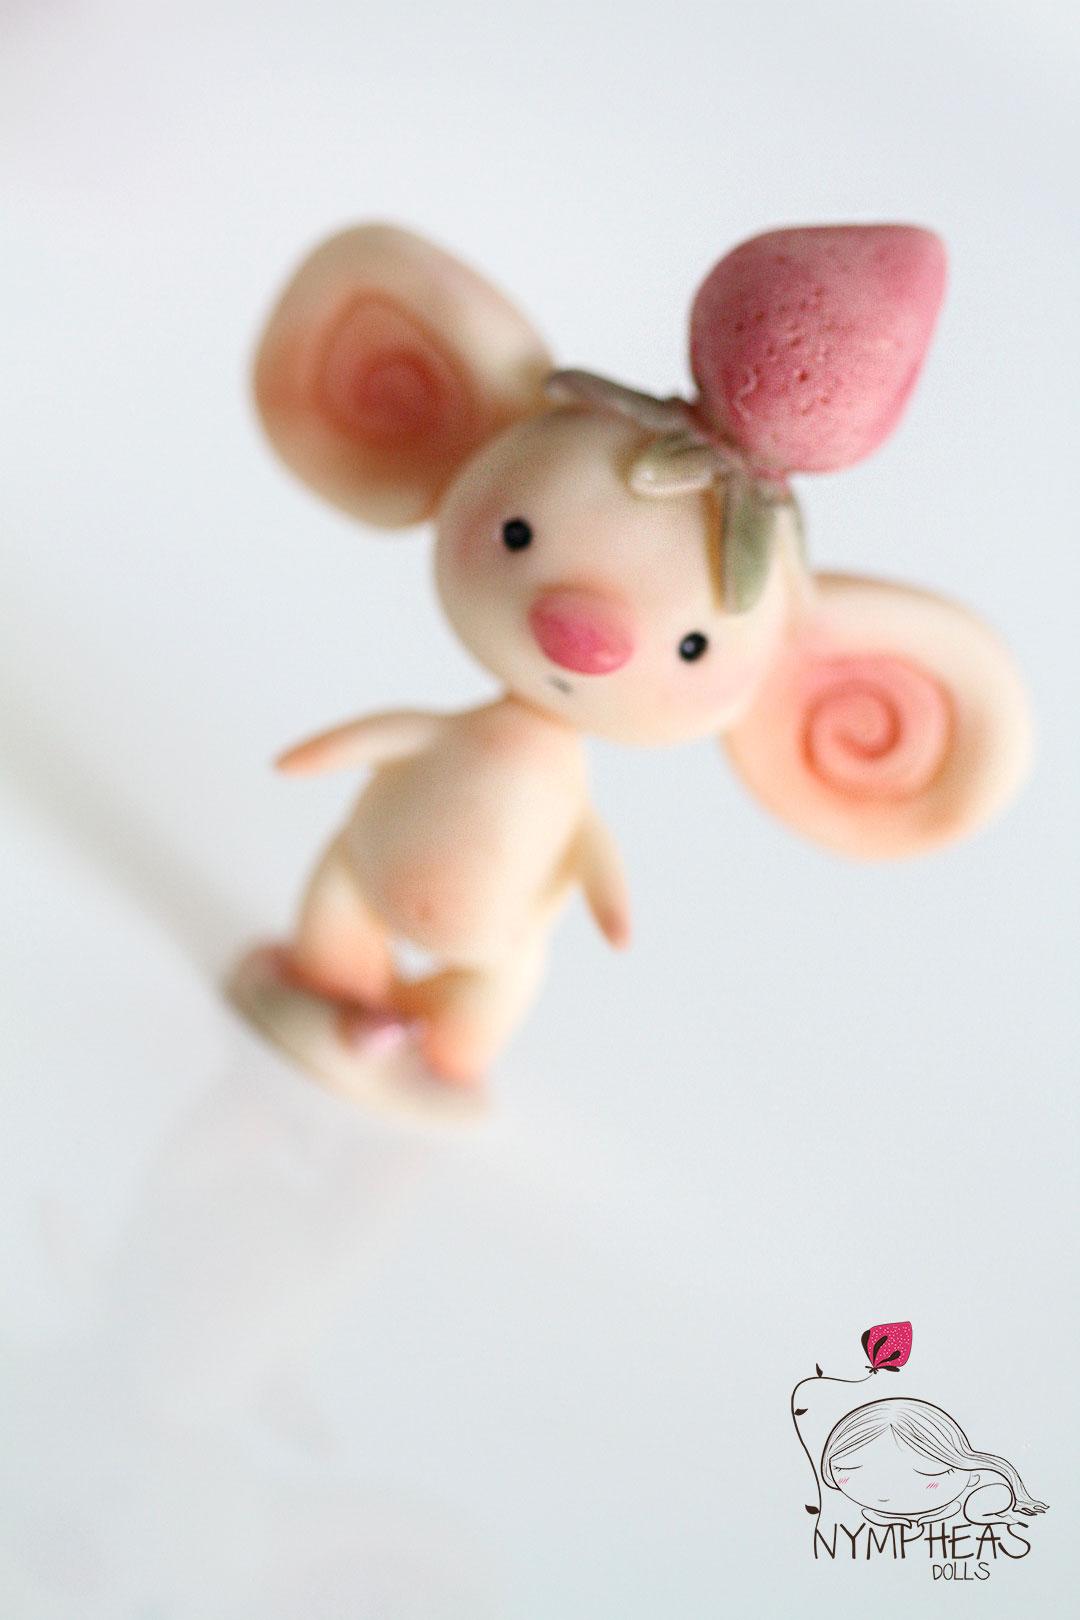 malicie-cream-nympheas-dolls-040